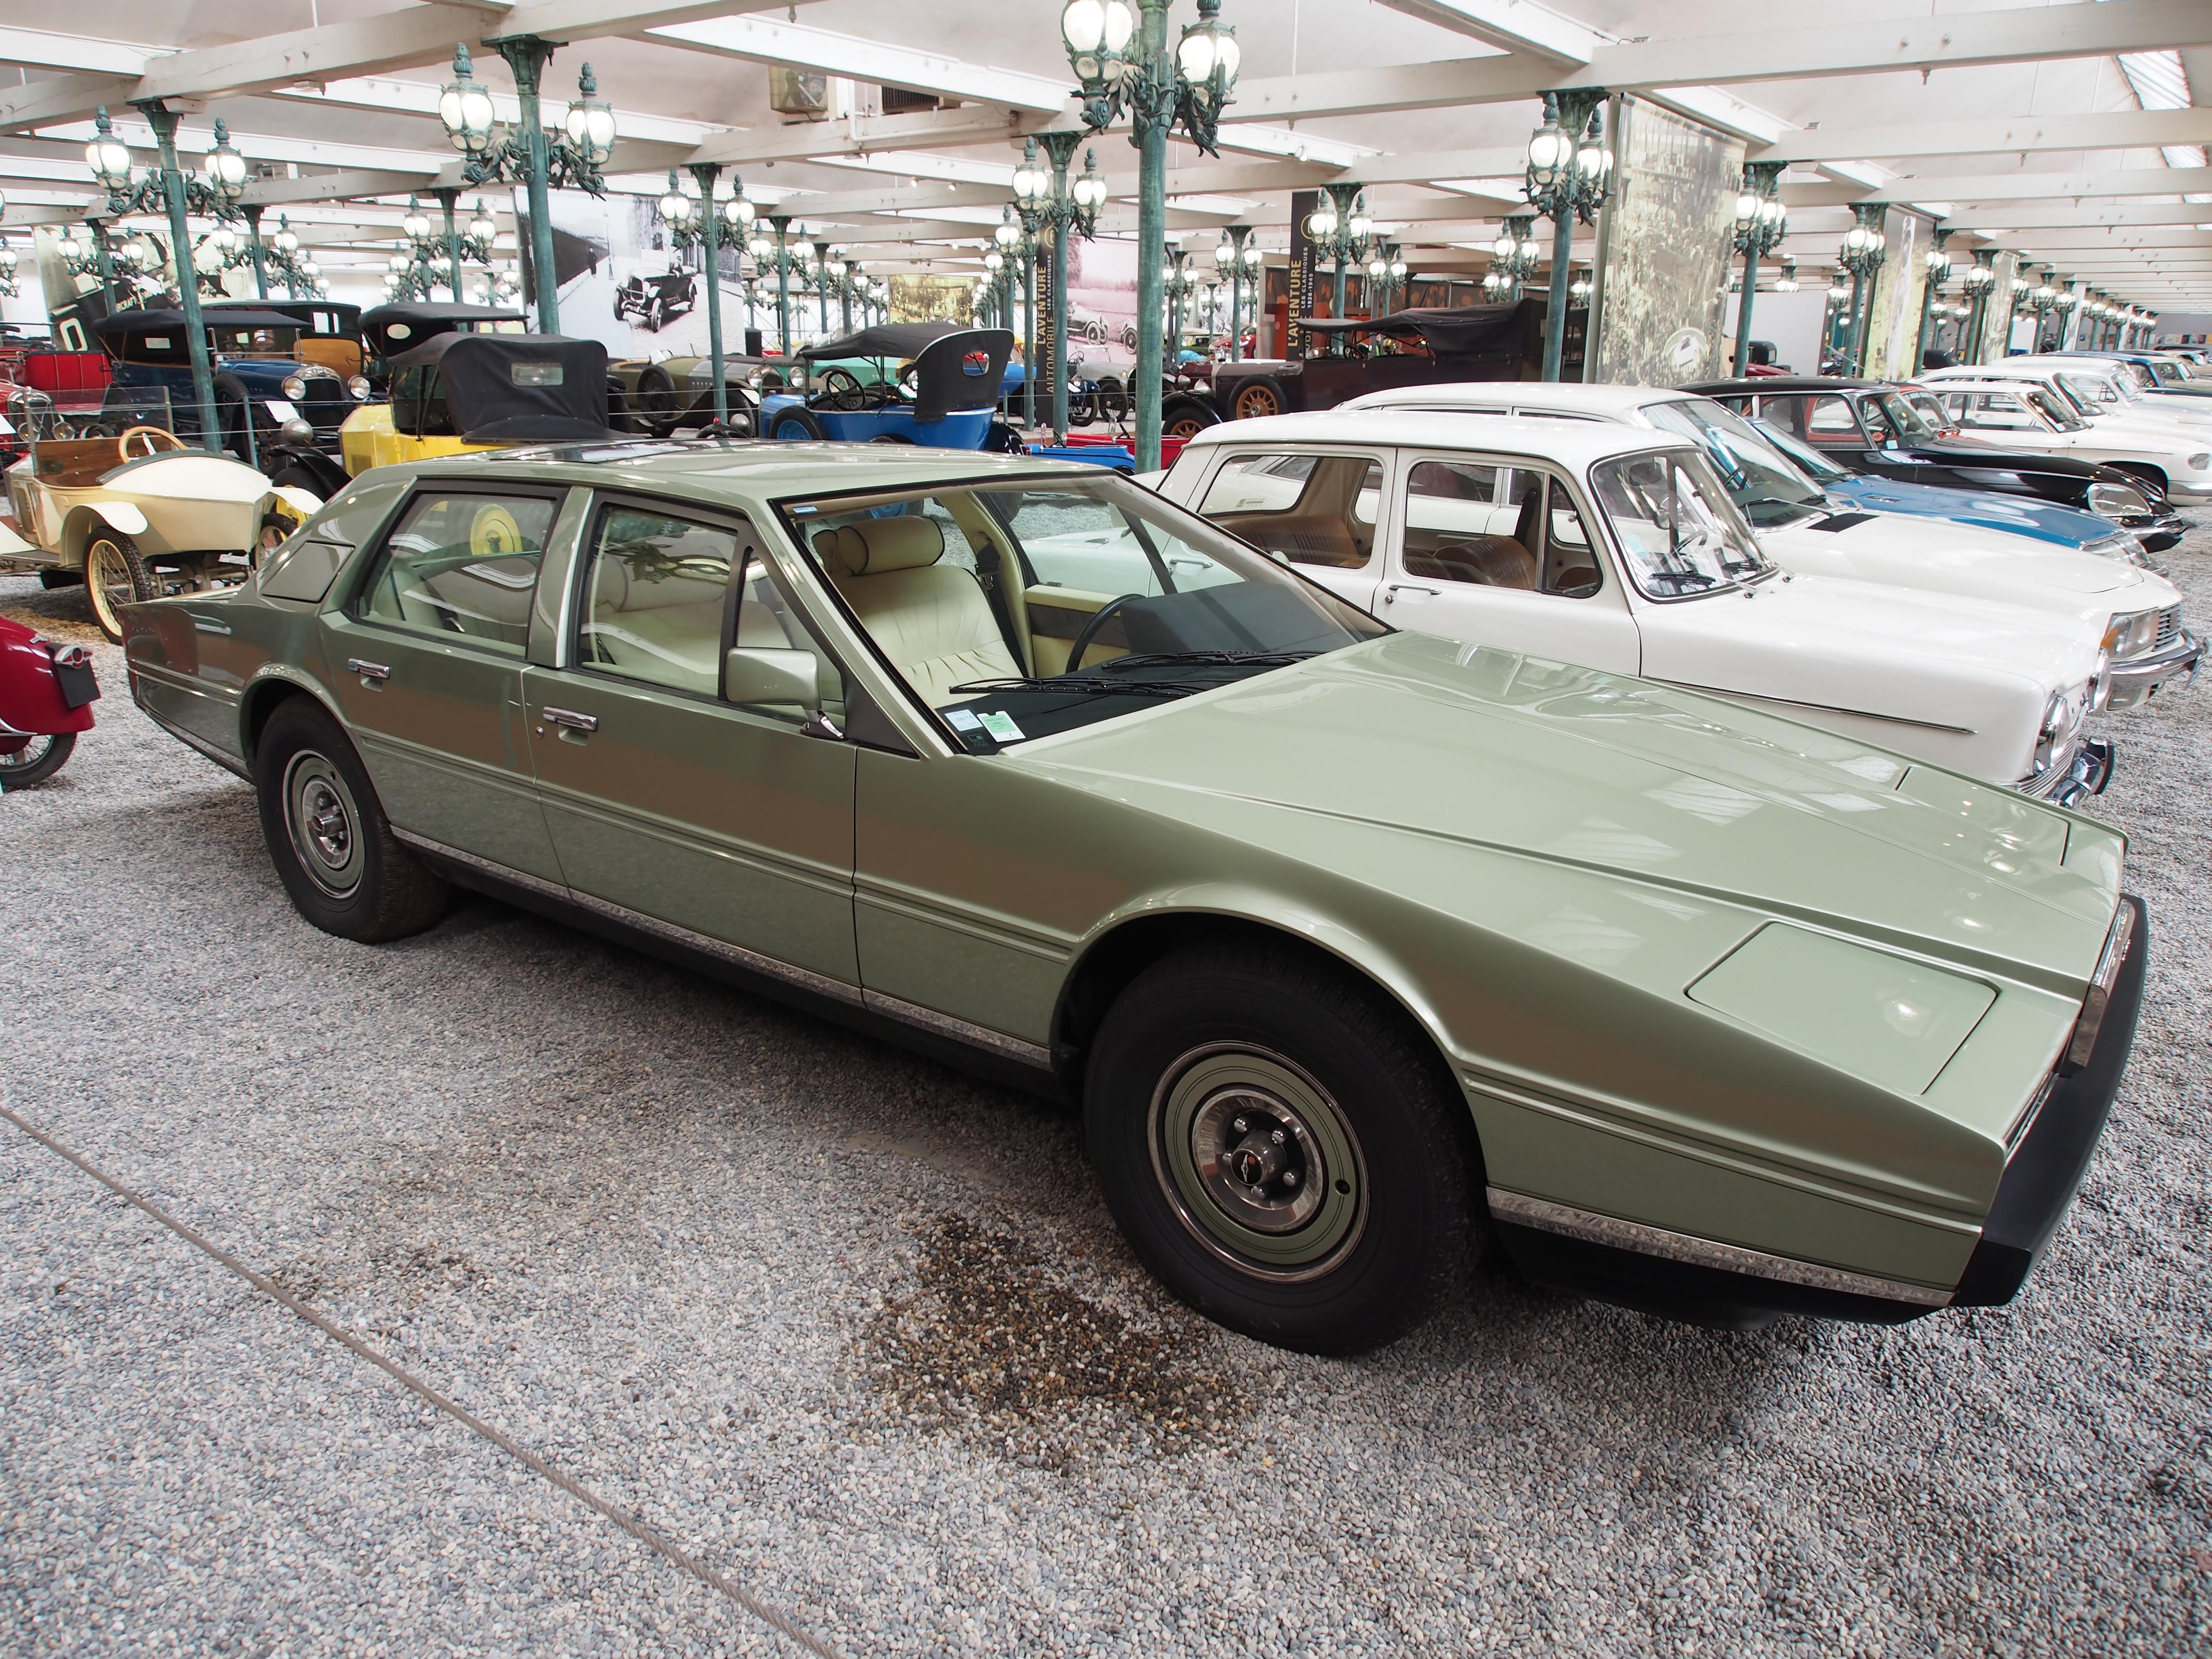 File 1982 Aston Martin Lagonda Series 2 V8 5340cm3 309hp 225kmh Pic3 Jpg Wikimedia Commons